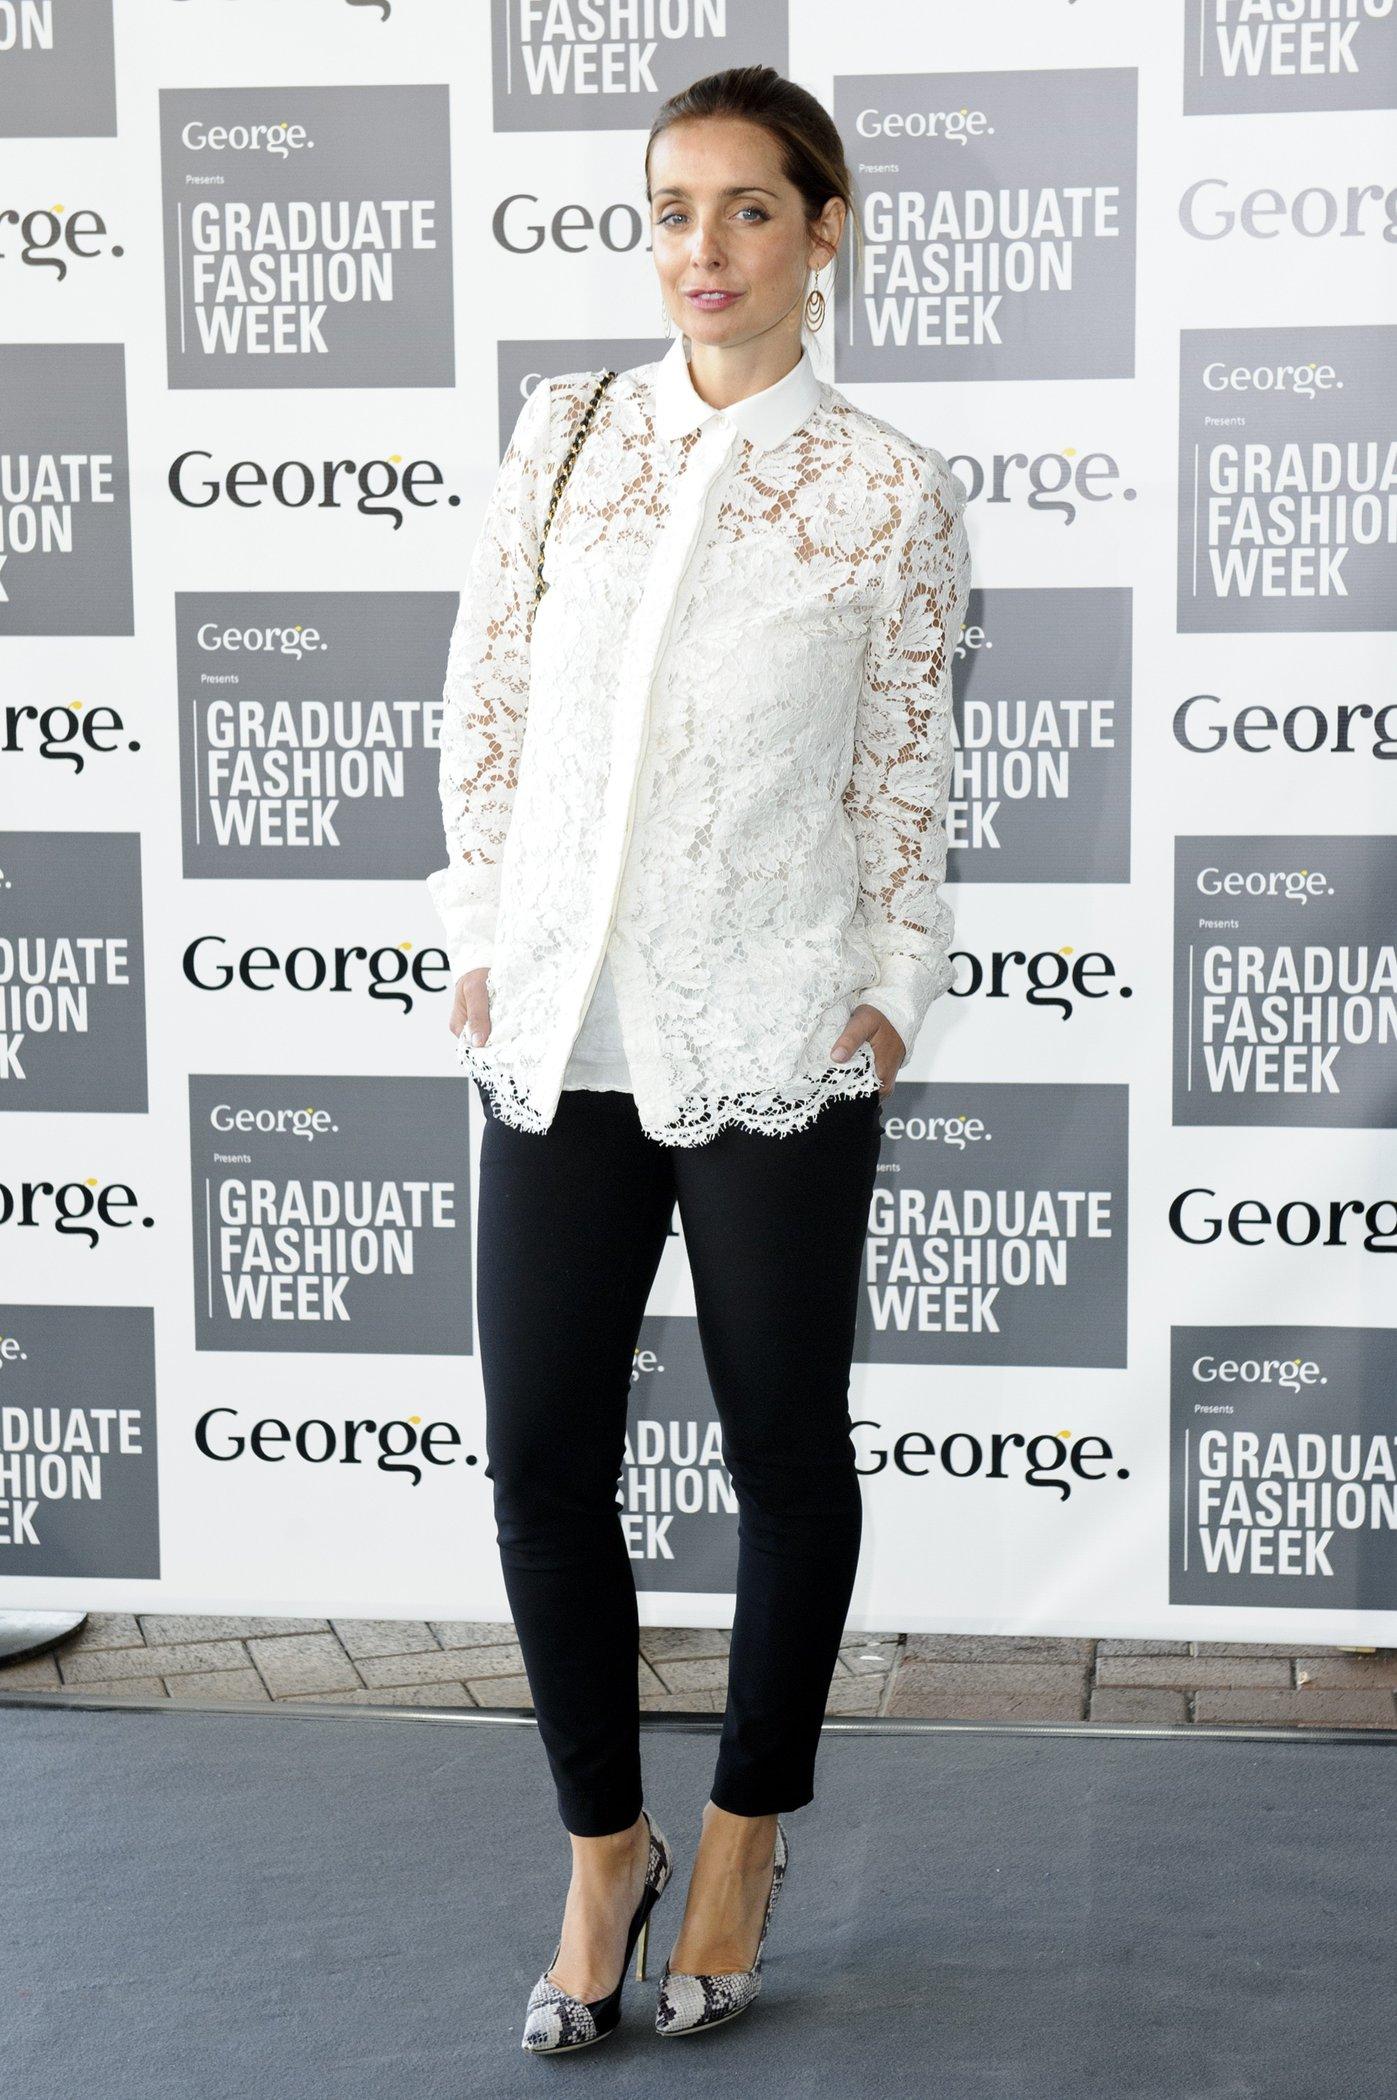 Graduate fashion week gala show 66